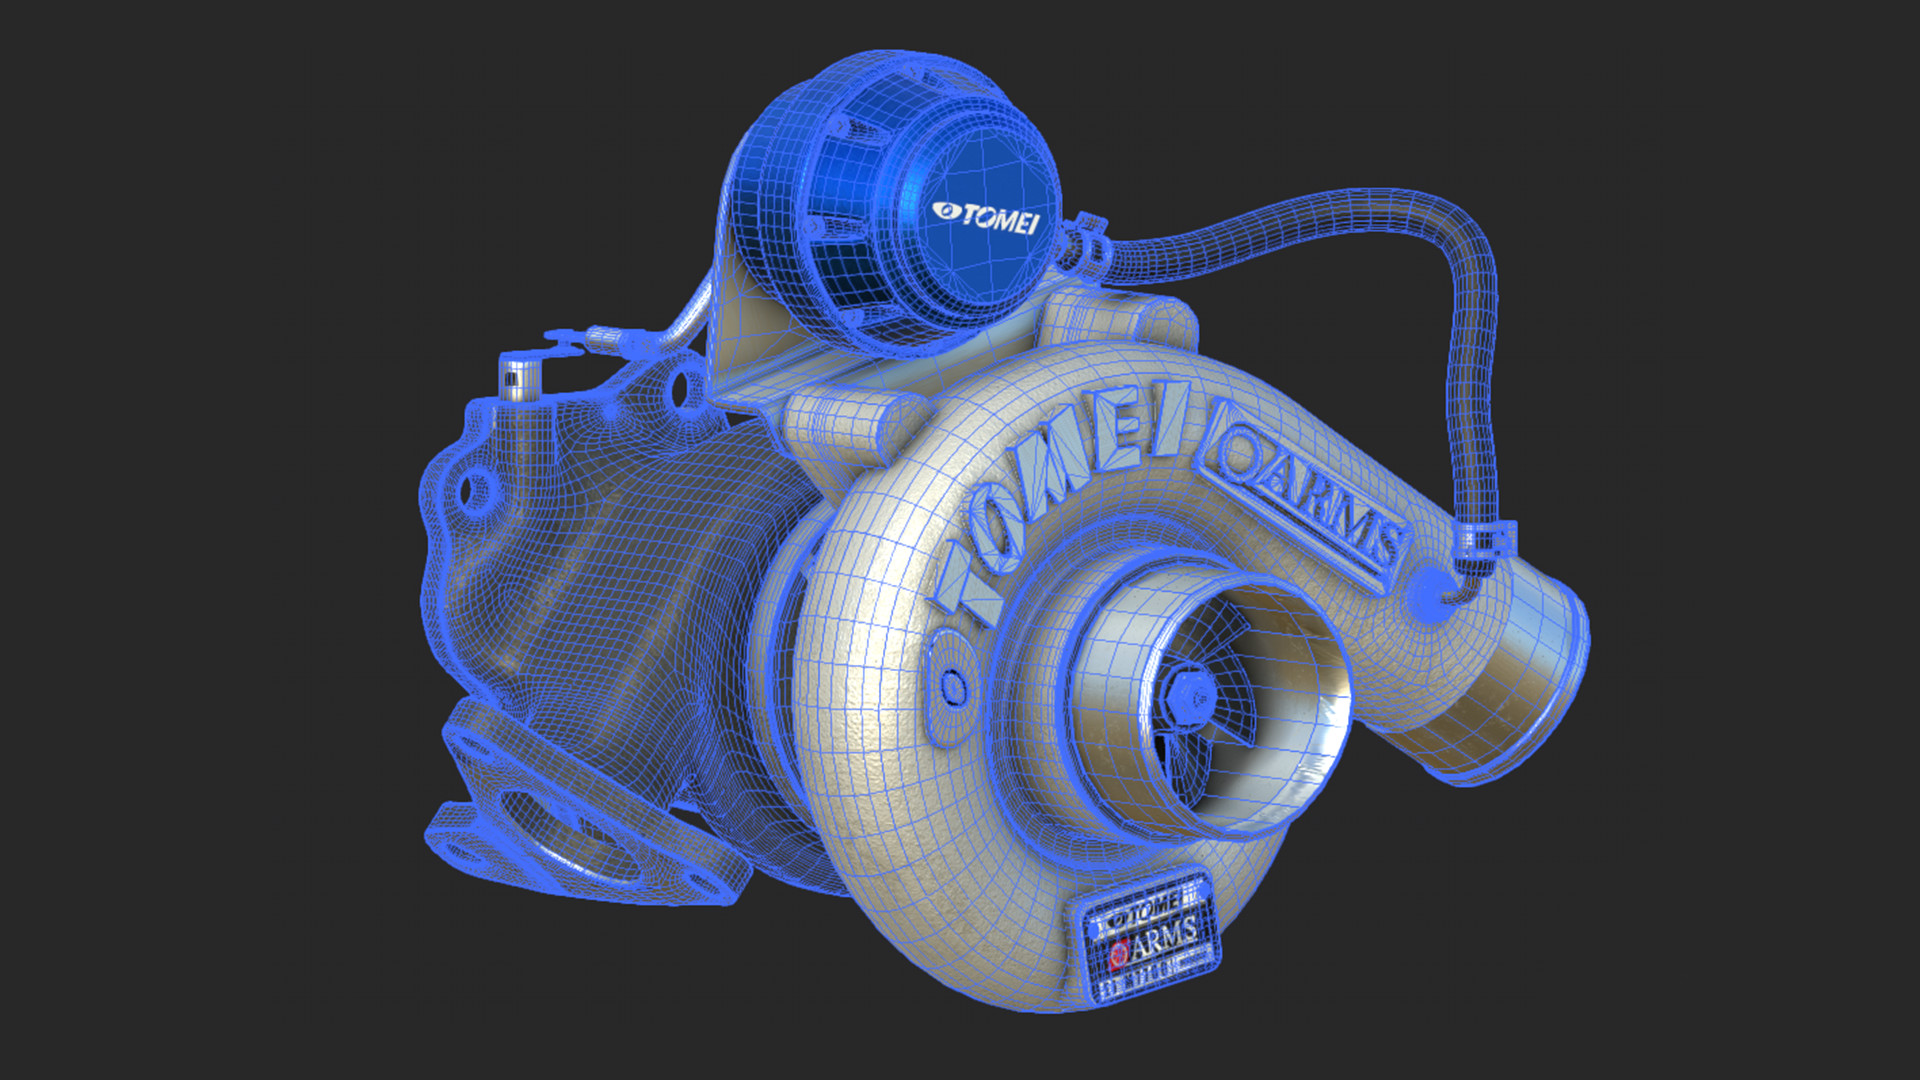 Billy sullivan turbo5 wire long